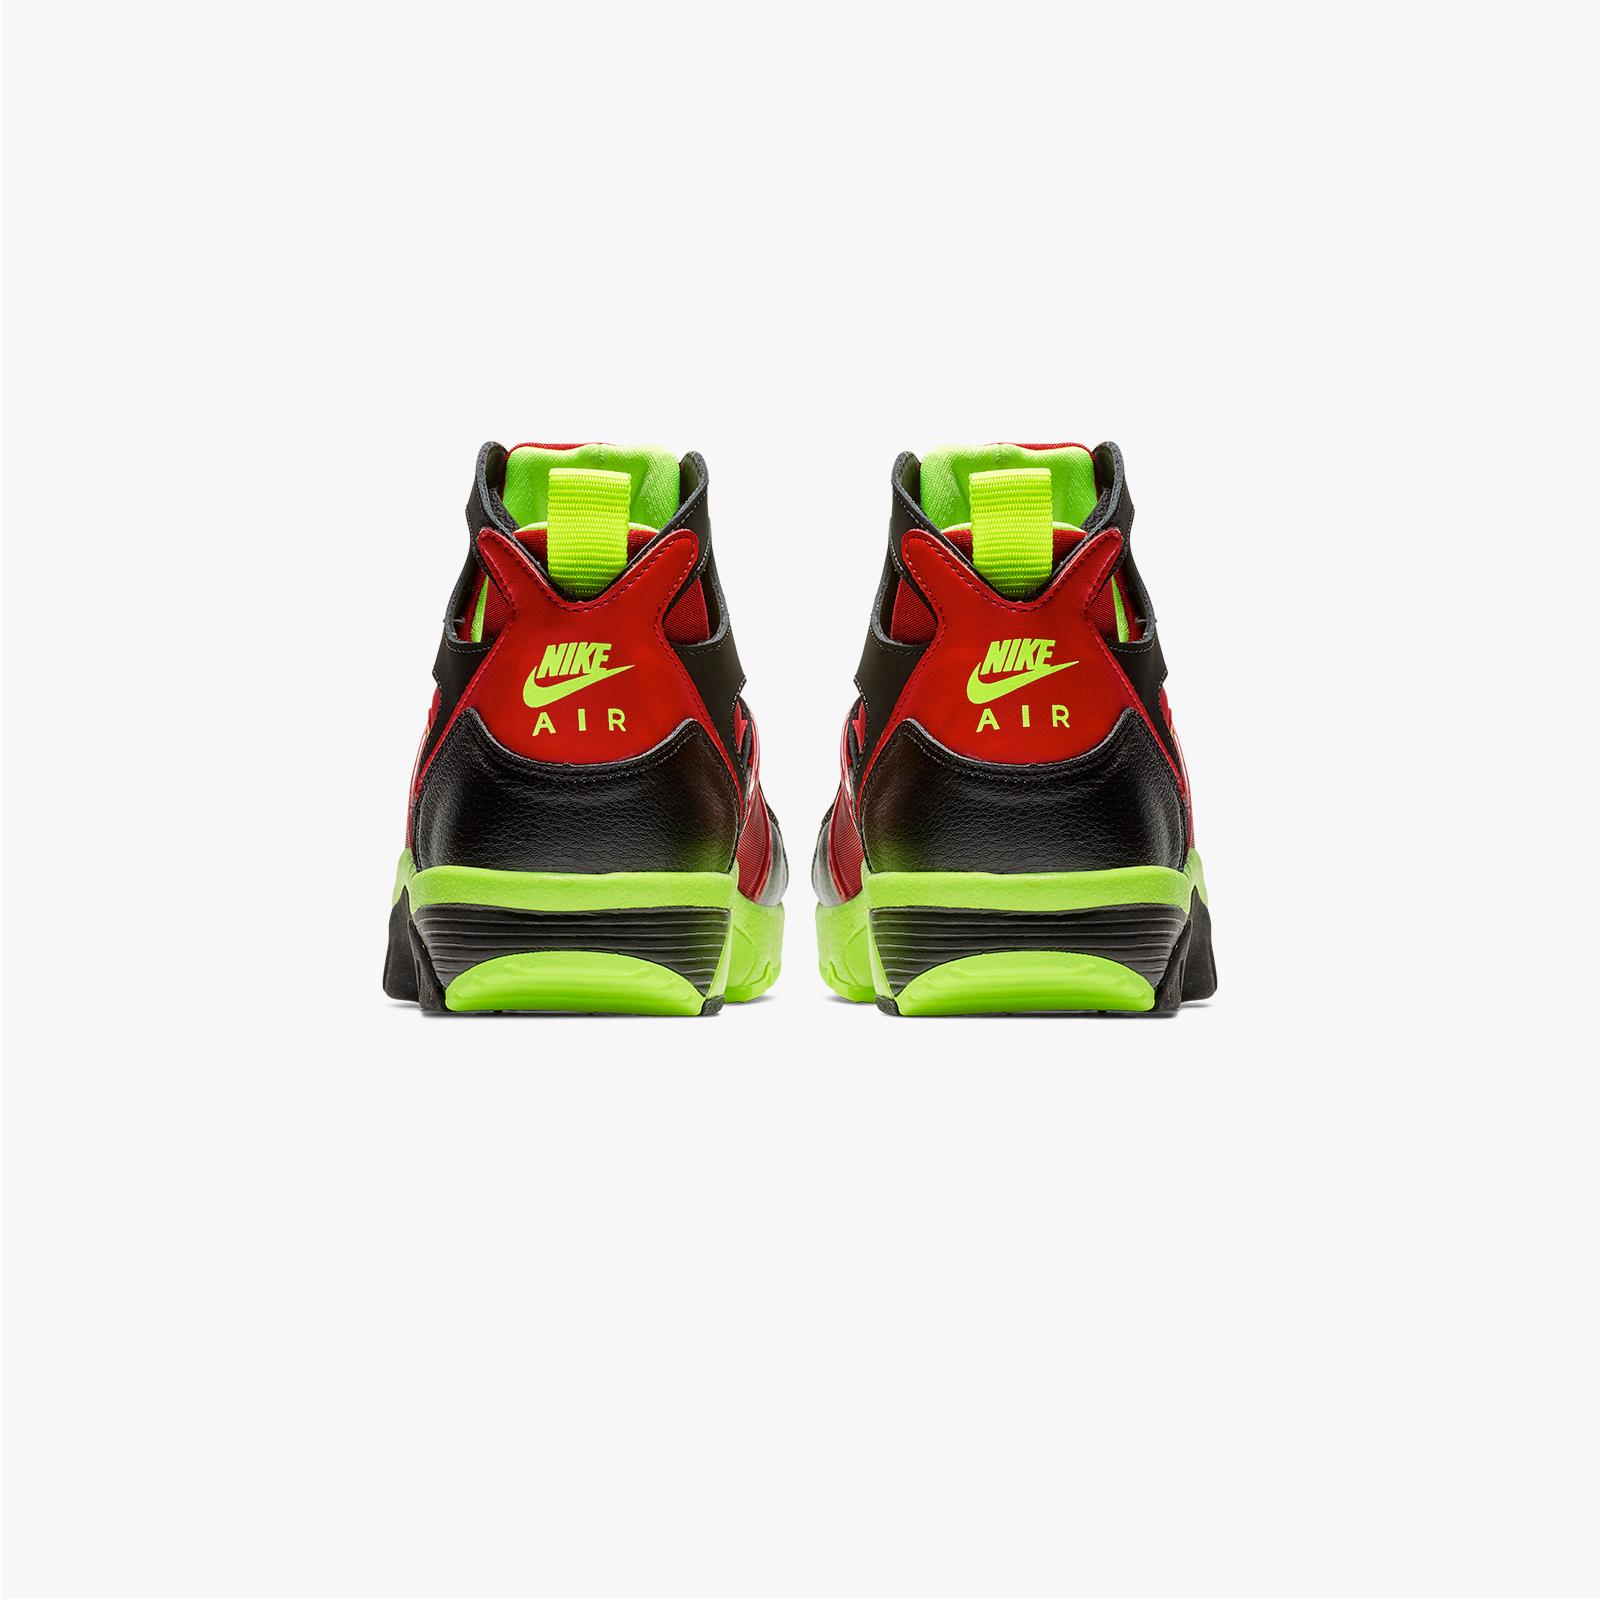 2ad50952ec3 Nike Air Trainer Huarache - 679083-020 - Sneakersnstuff